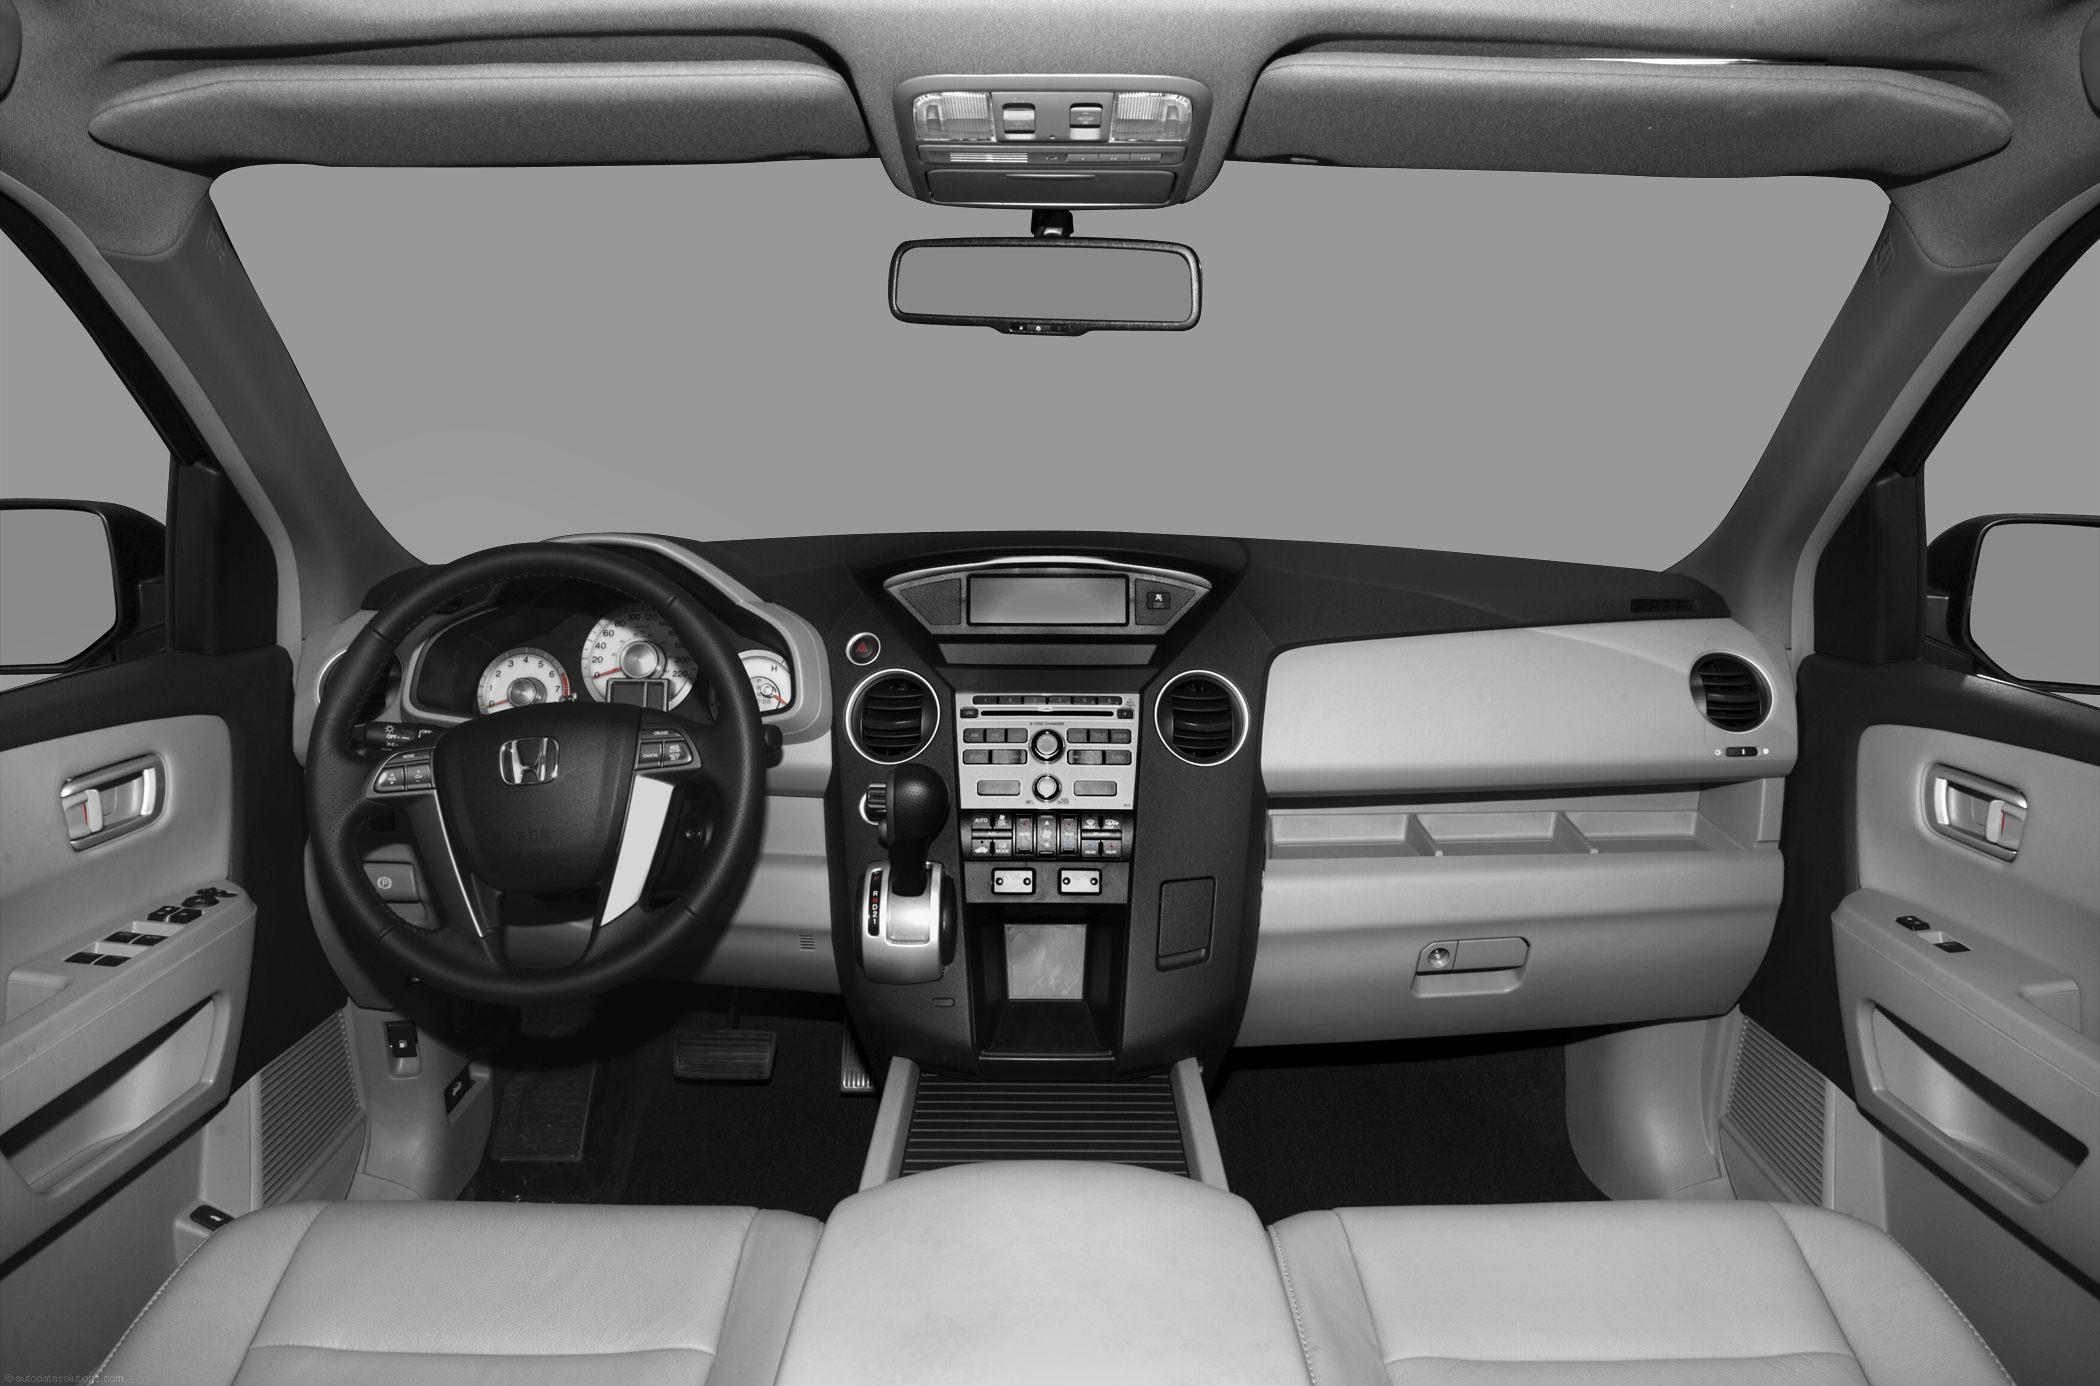 2011 Honda Pilot Image 11